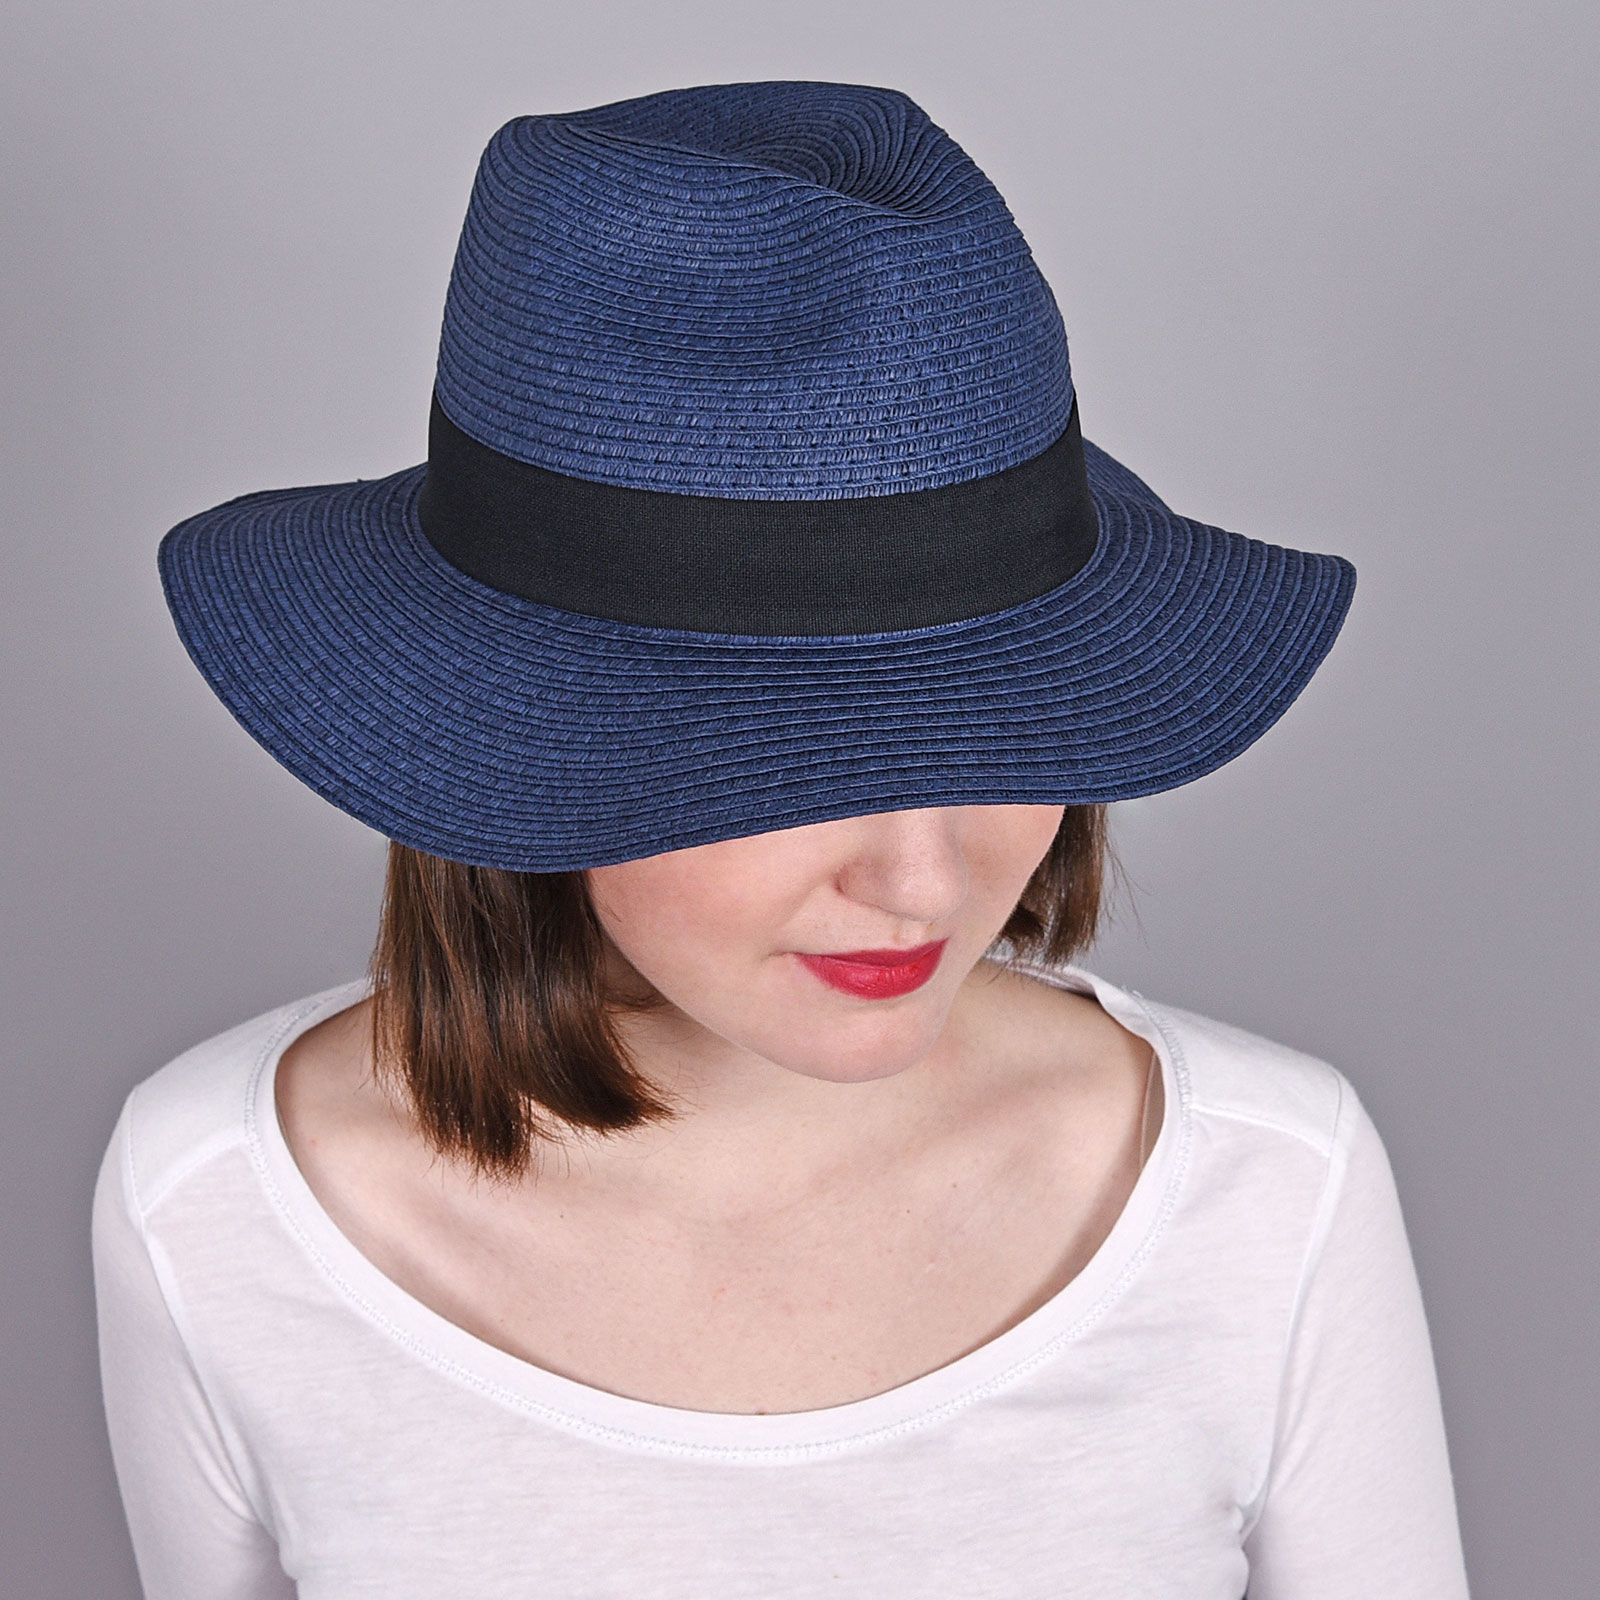 CP-00740-marine-V16-2-trilby-femme-bleu-bandeau-noir